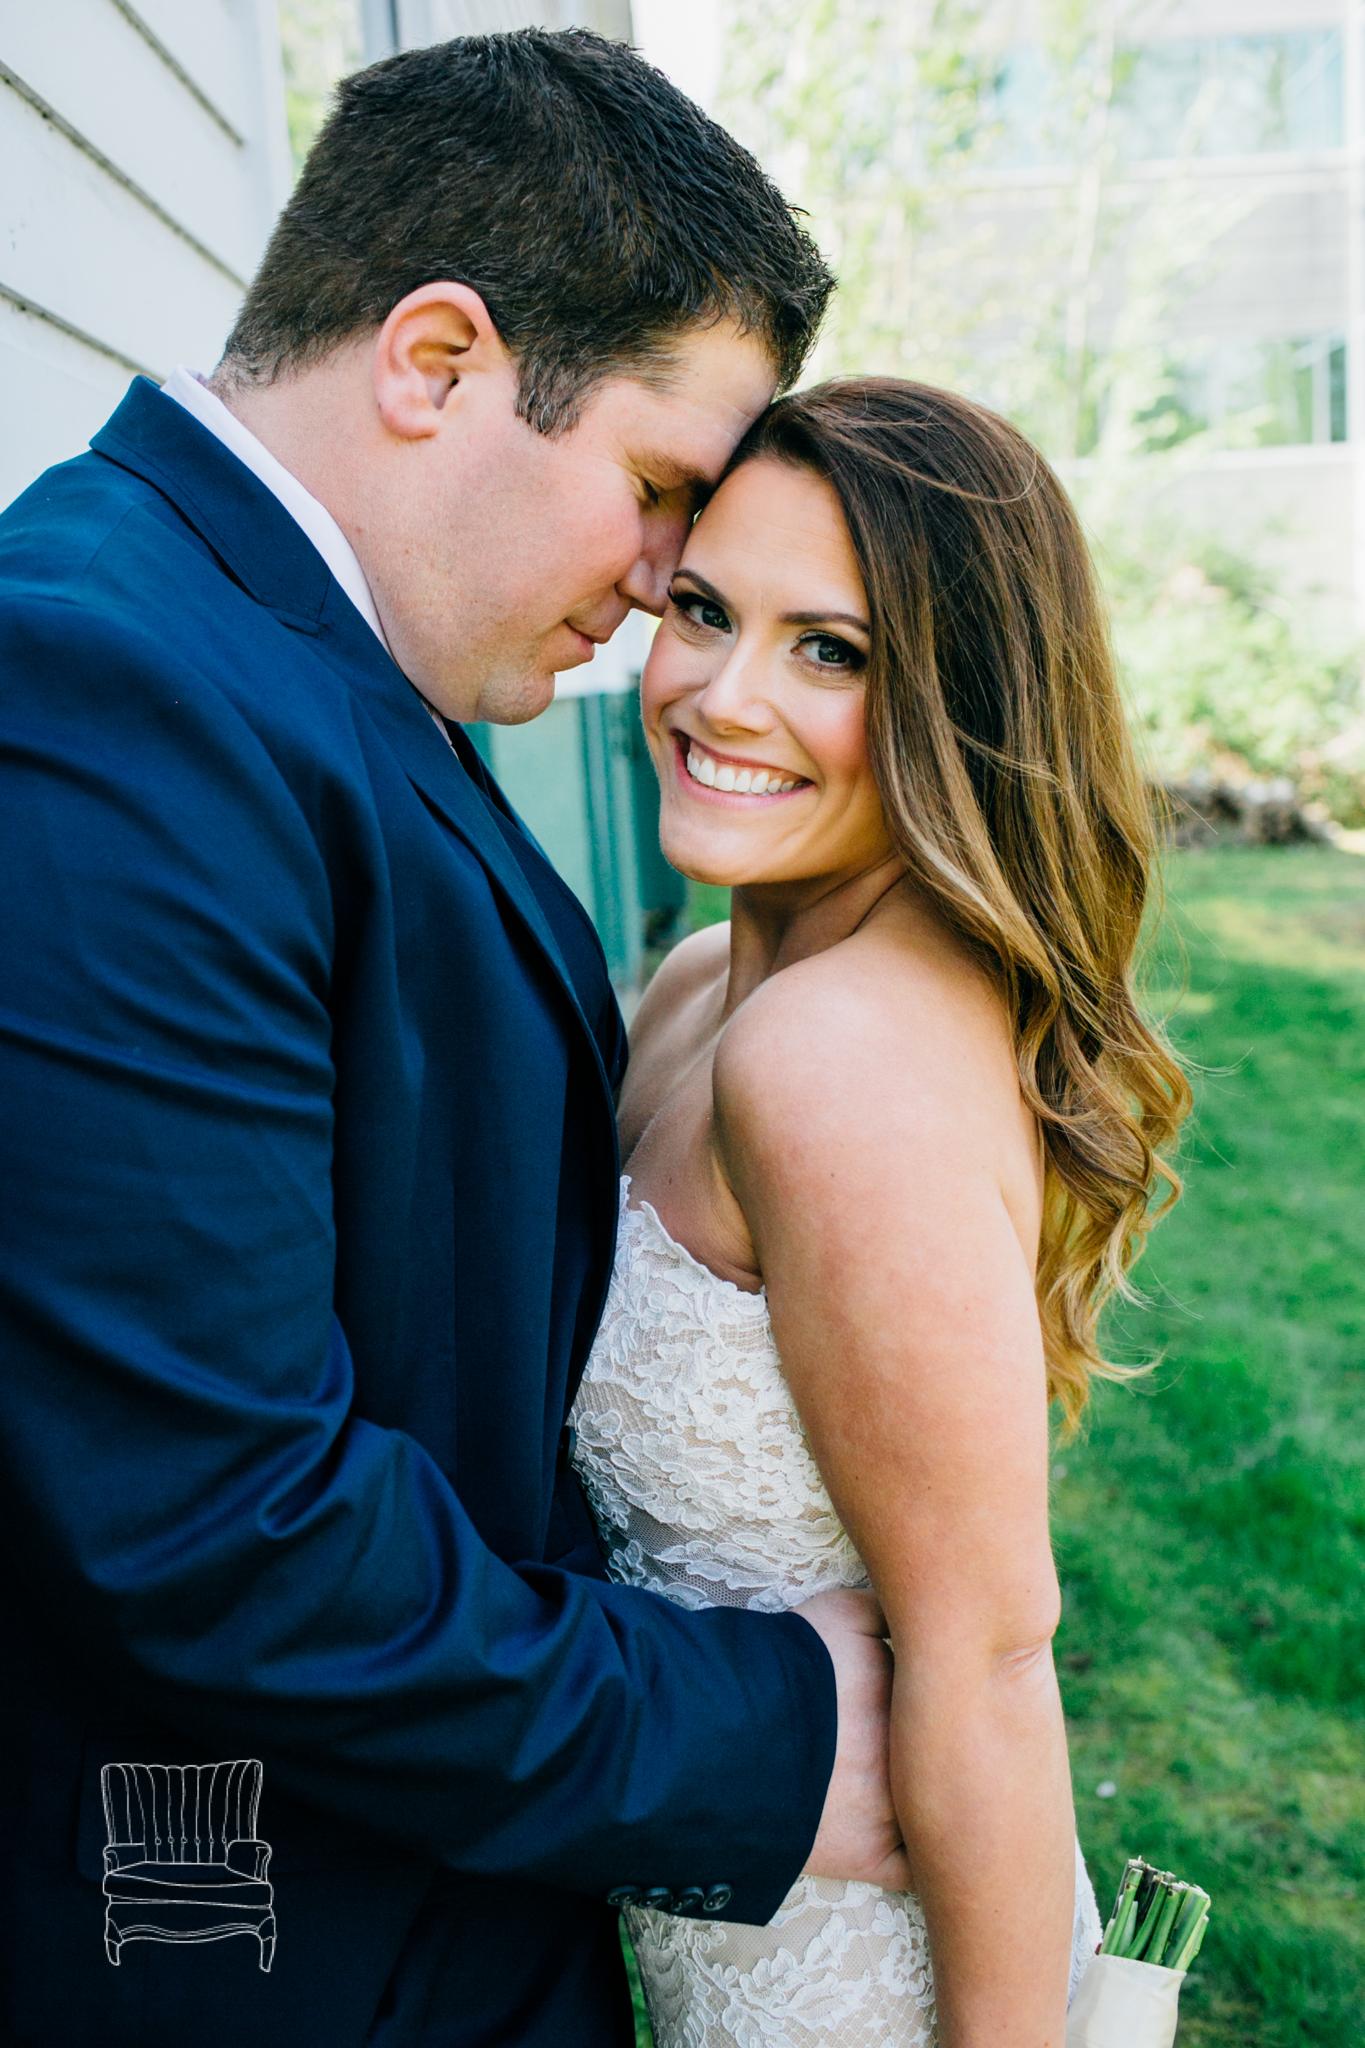 seattle-wedding-photographer-katheryn-moran-russells-bothell-wilkins-wedding-photo-30.jpg